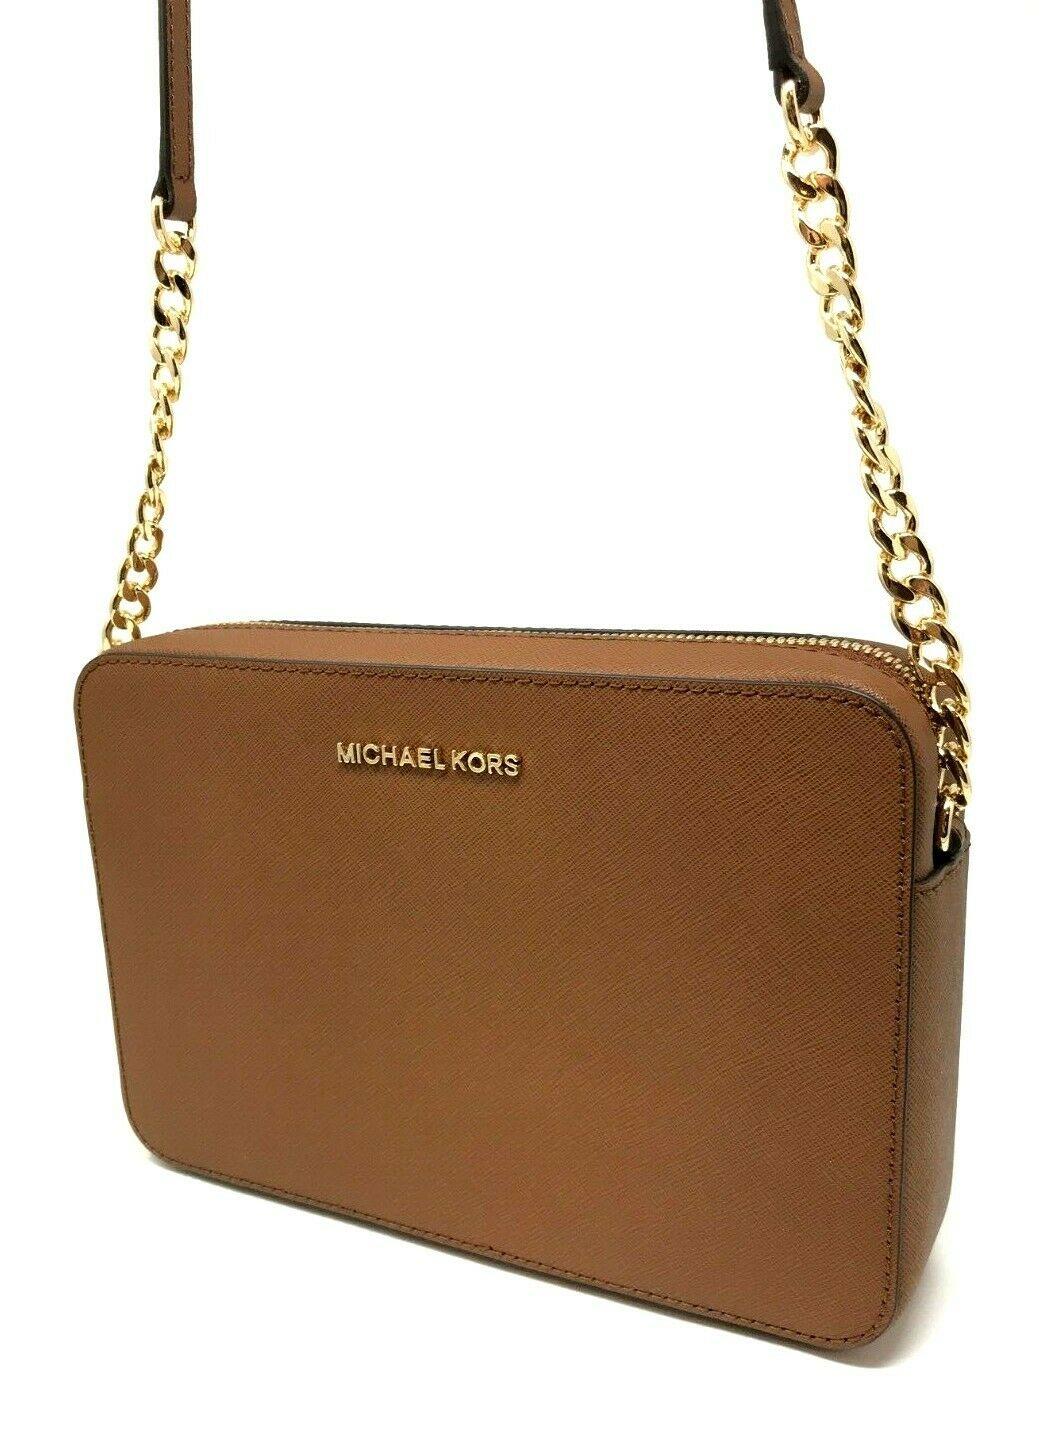 thumbnail 9 - Michael Kors Jet Set Item Large East West Crossbody Chain Handbag Clutch $298